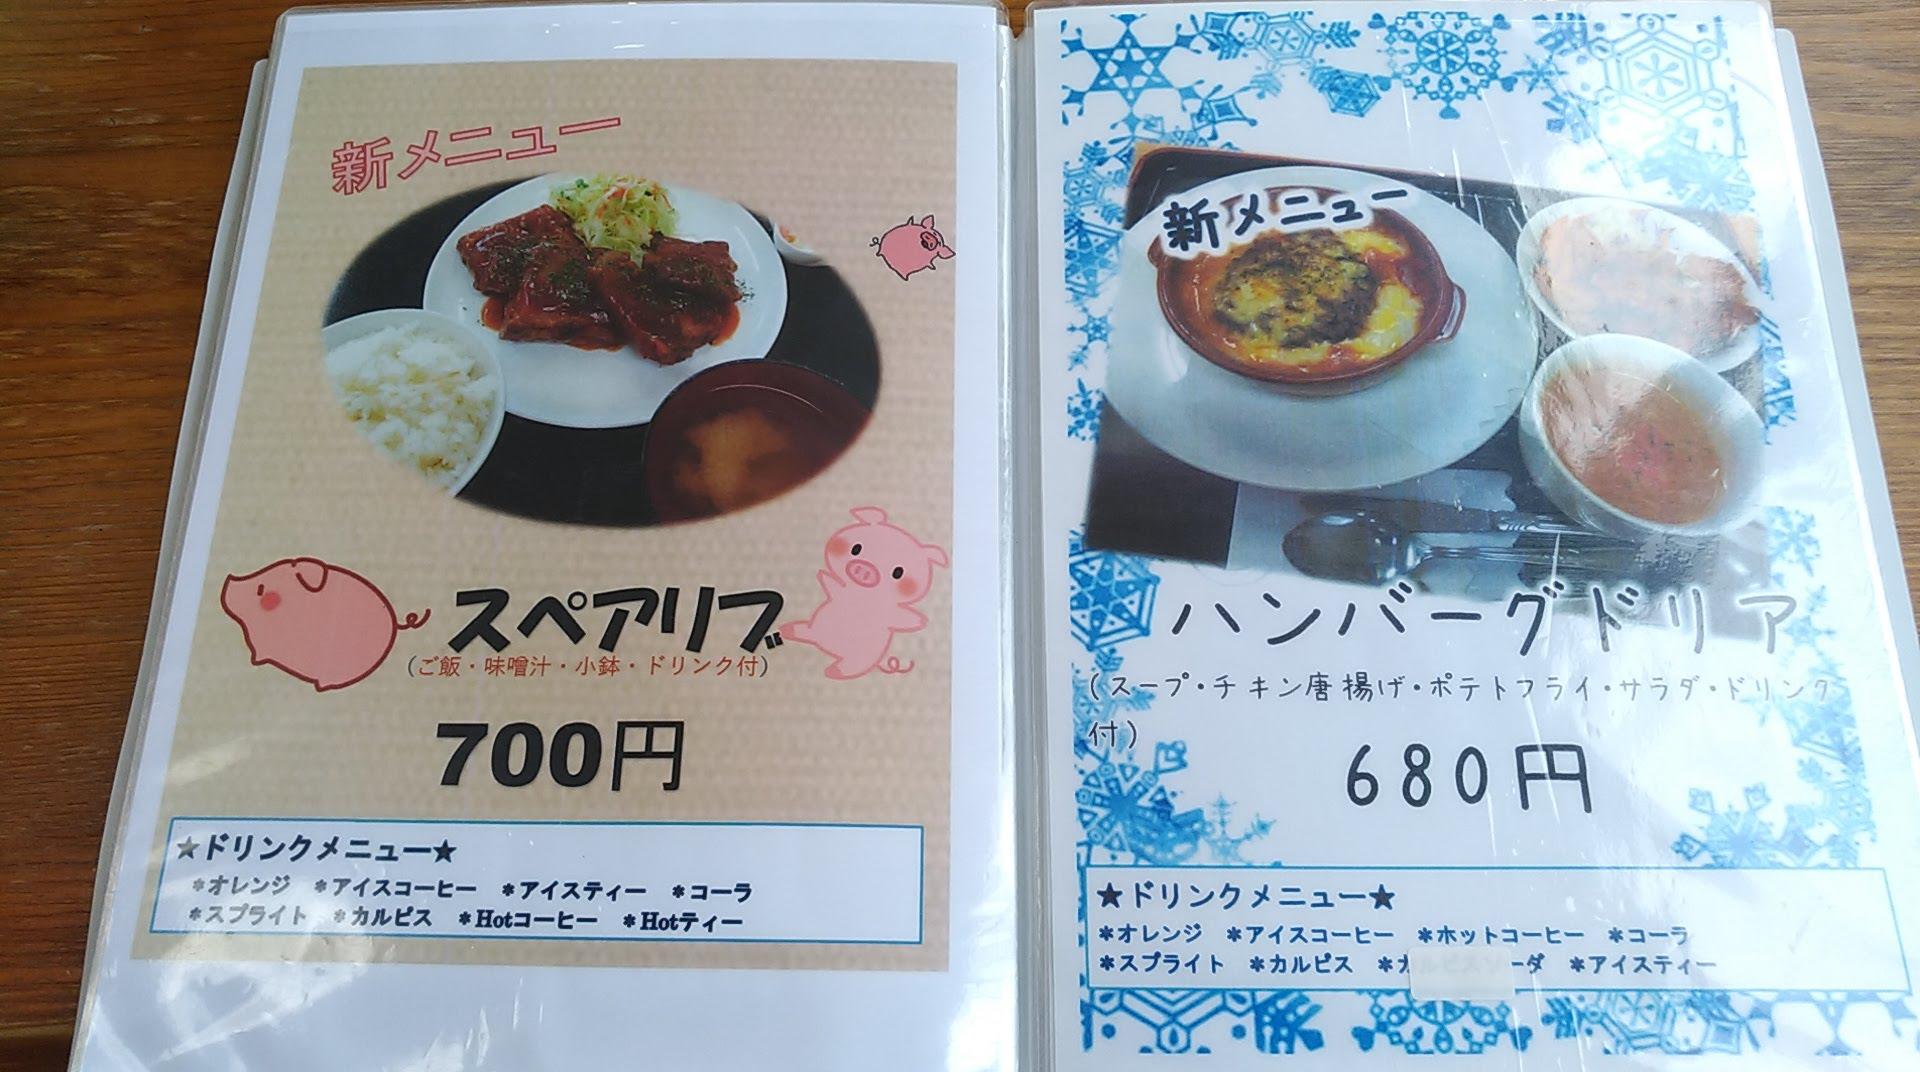 the menu of Pure shokudou 11